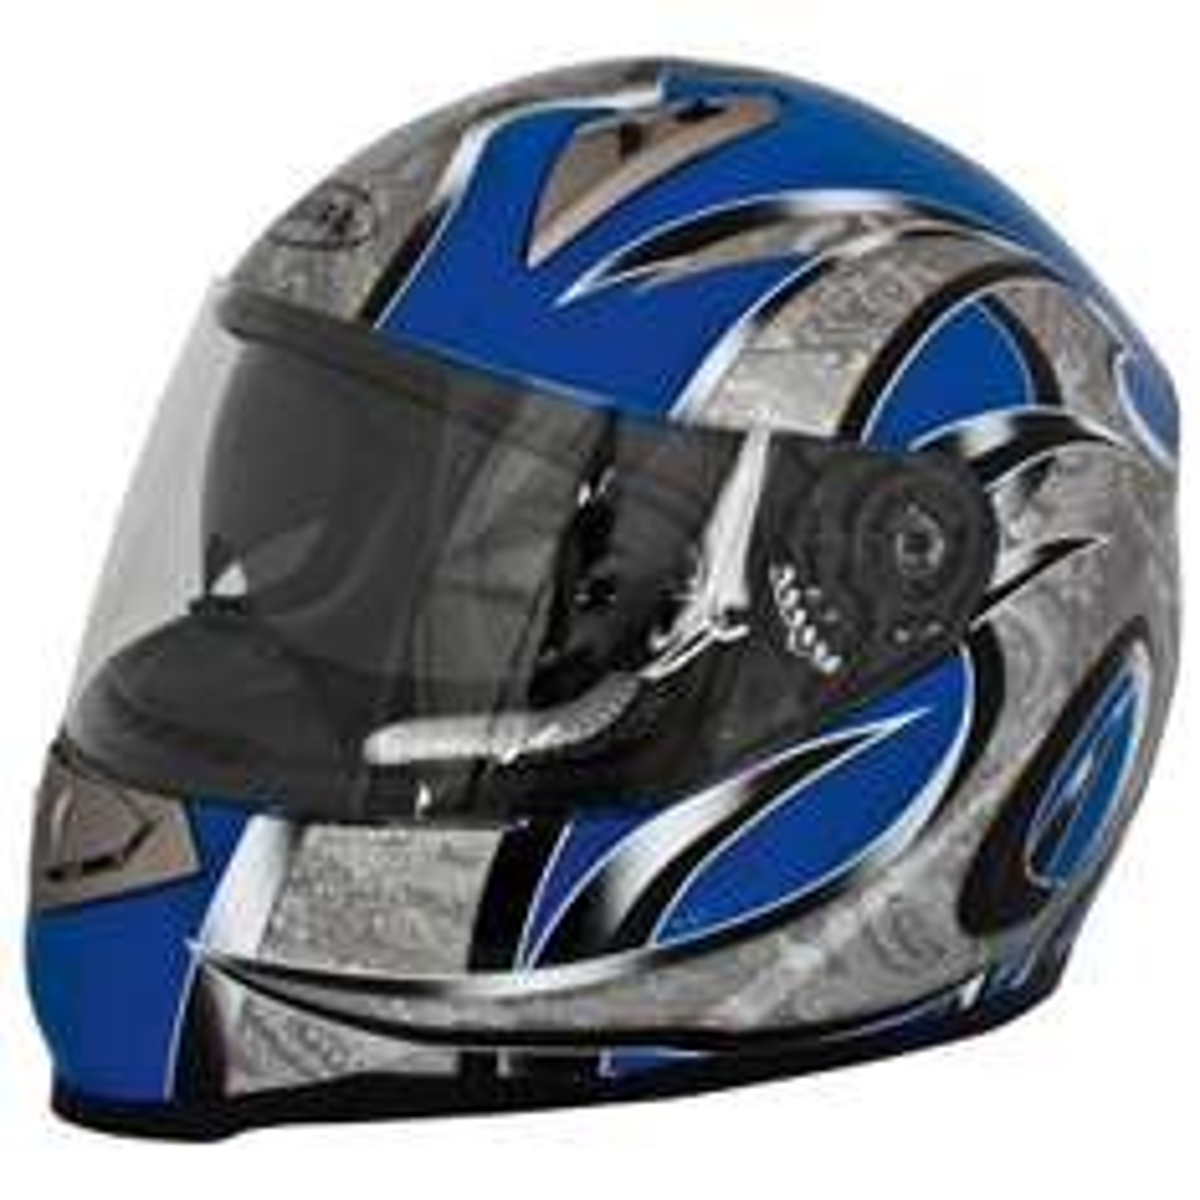 AKIRA Motorradhelm Akira Mito RO 200i Integral mit Sonnenvisier Größe: 57 - 58 cm  Farbe: schwarz/blau